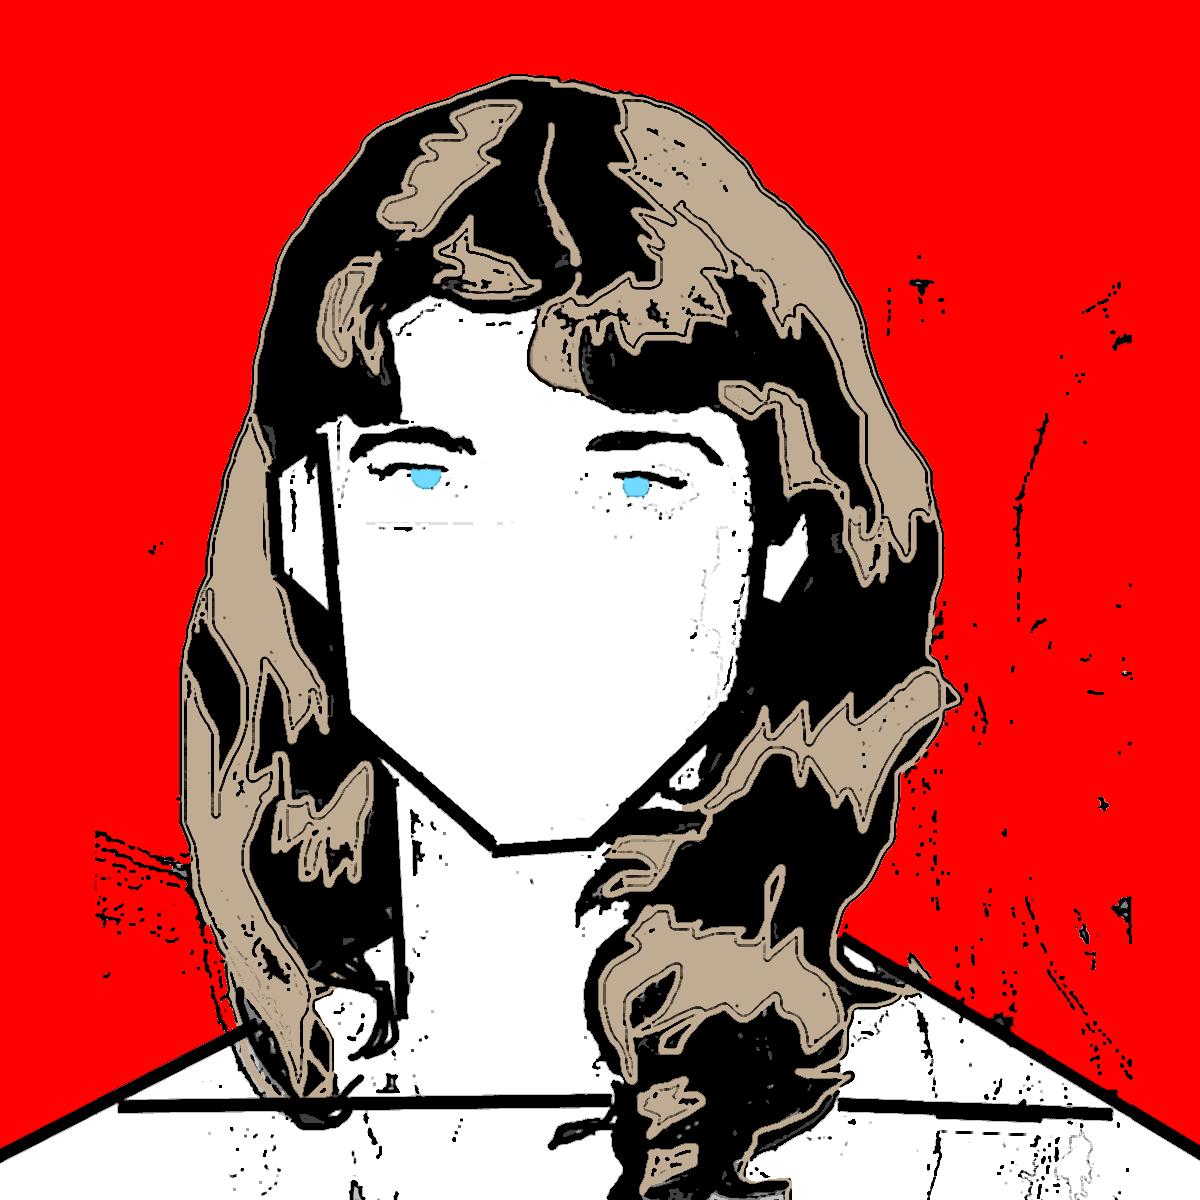 Diana Stahl